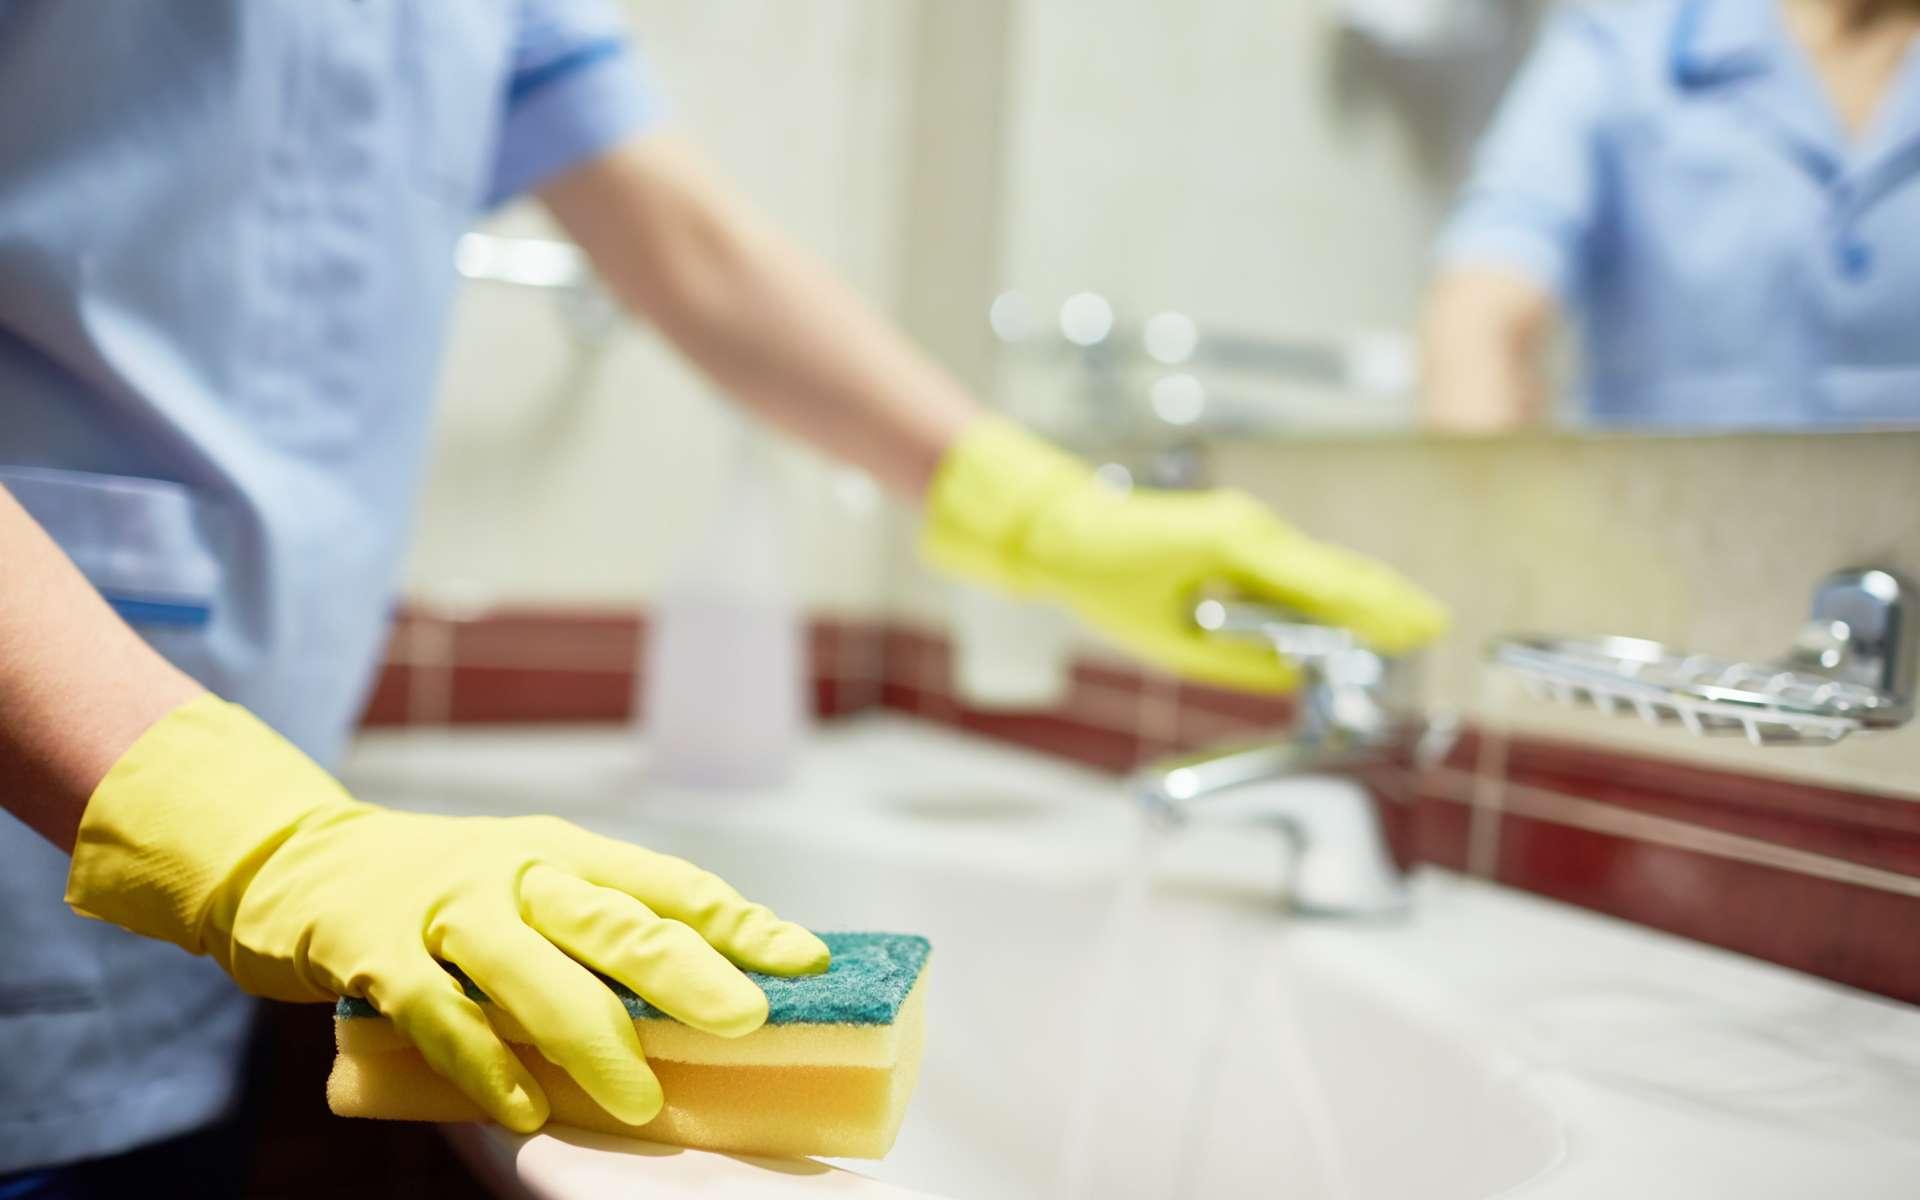 La stricte application des règles d'hygiène © shironosov, IStock.com